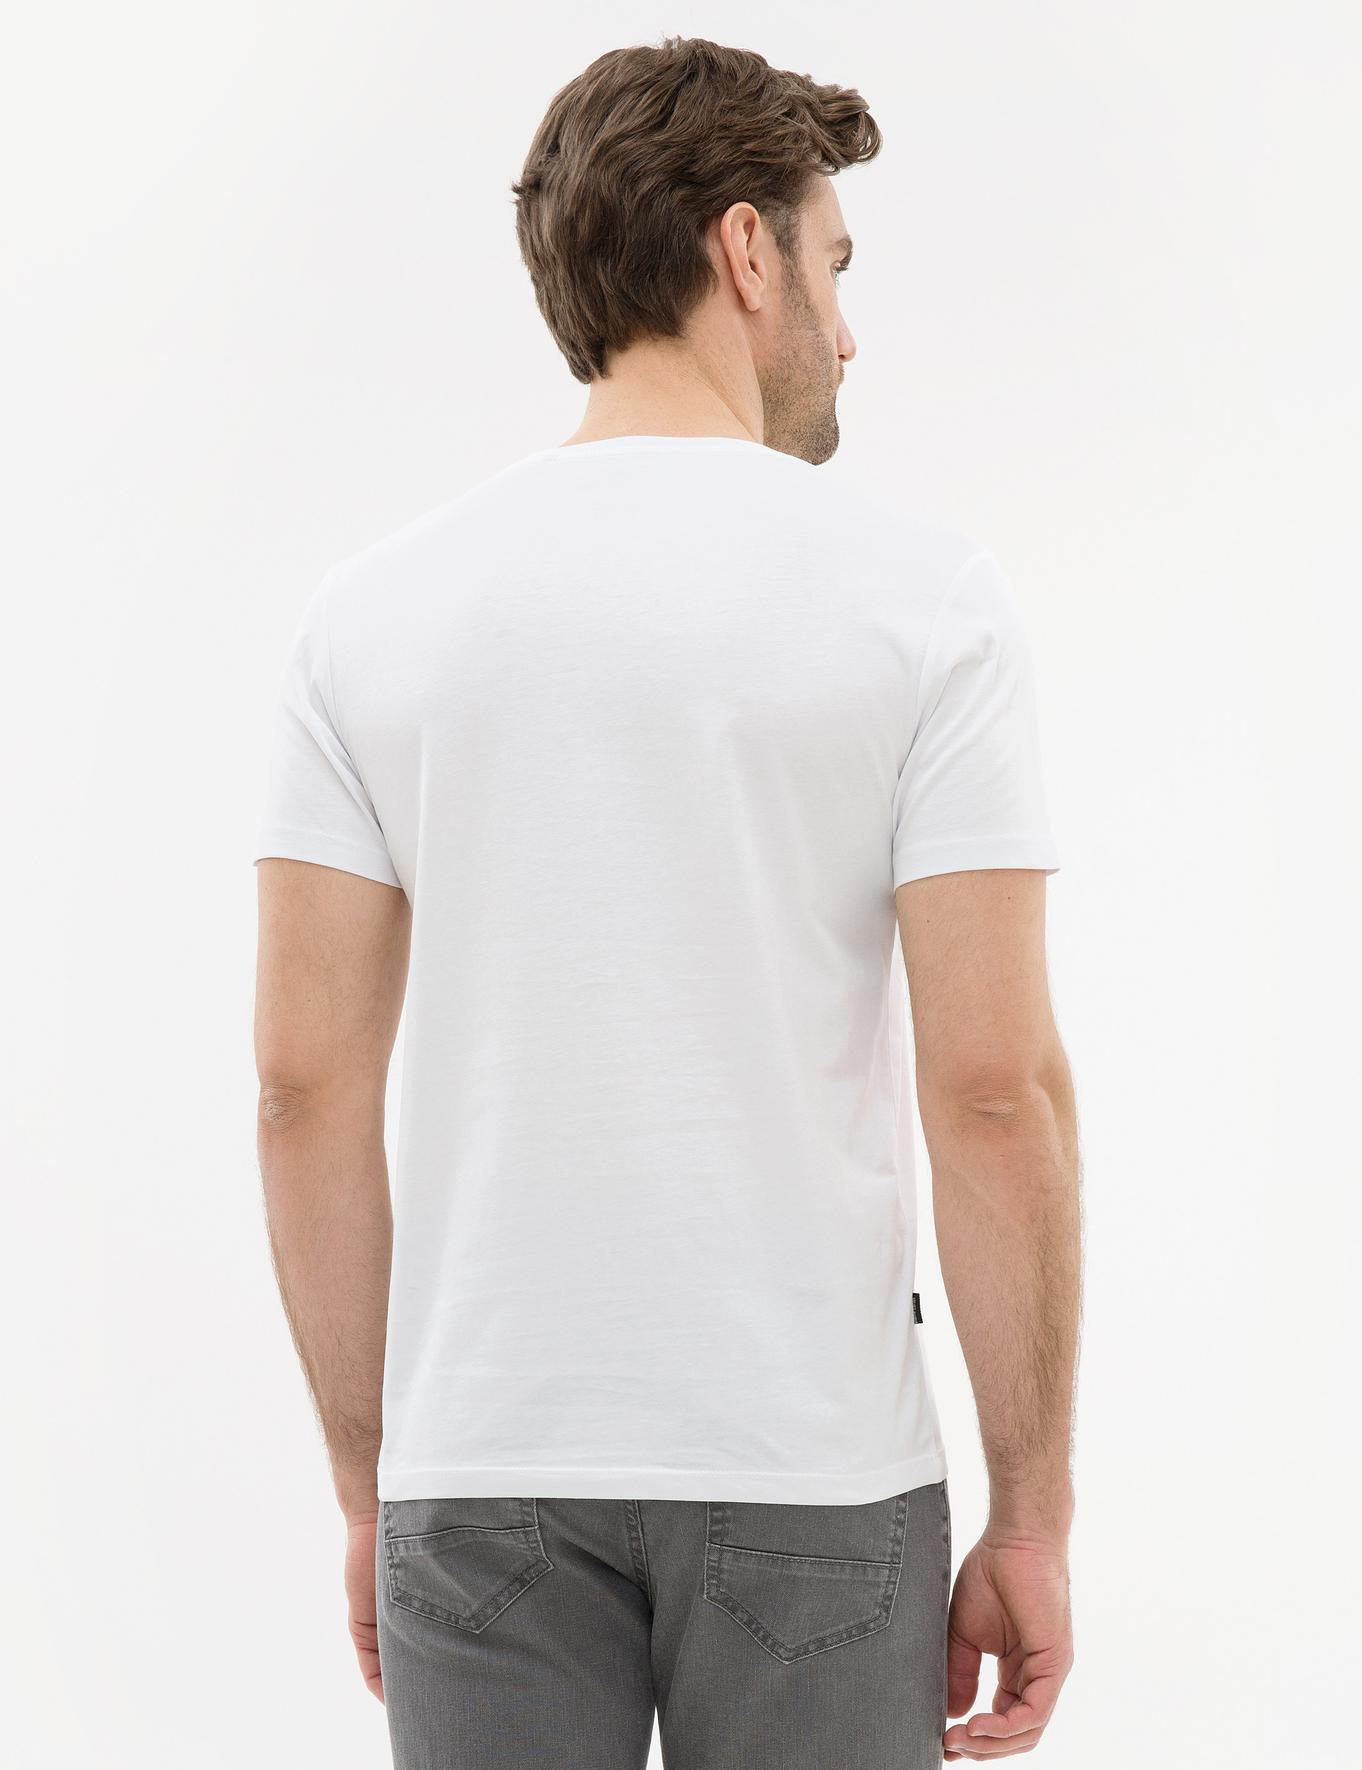 Kahverengi Çizgili Regular Fit Bisiklet Yaka T-Shirt